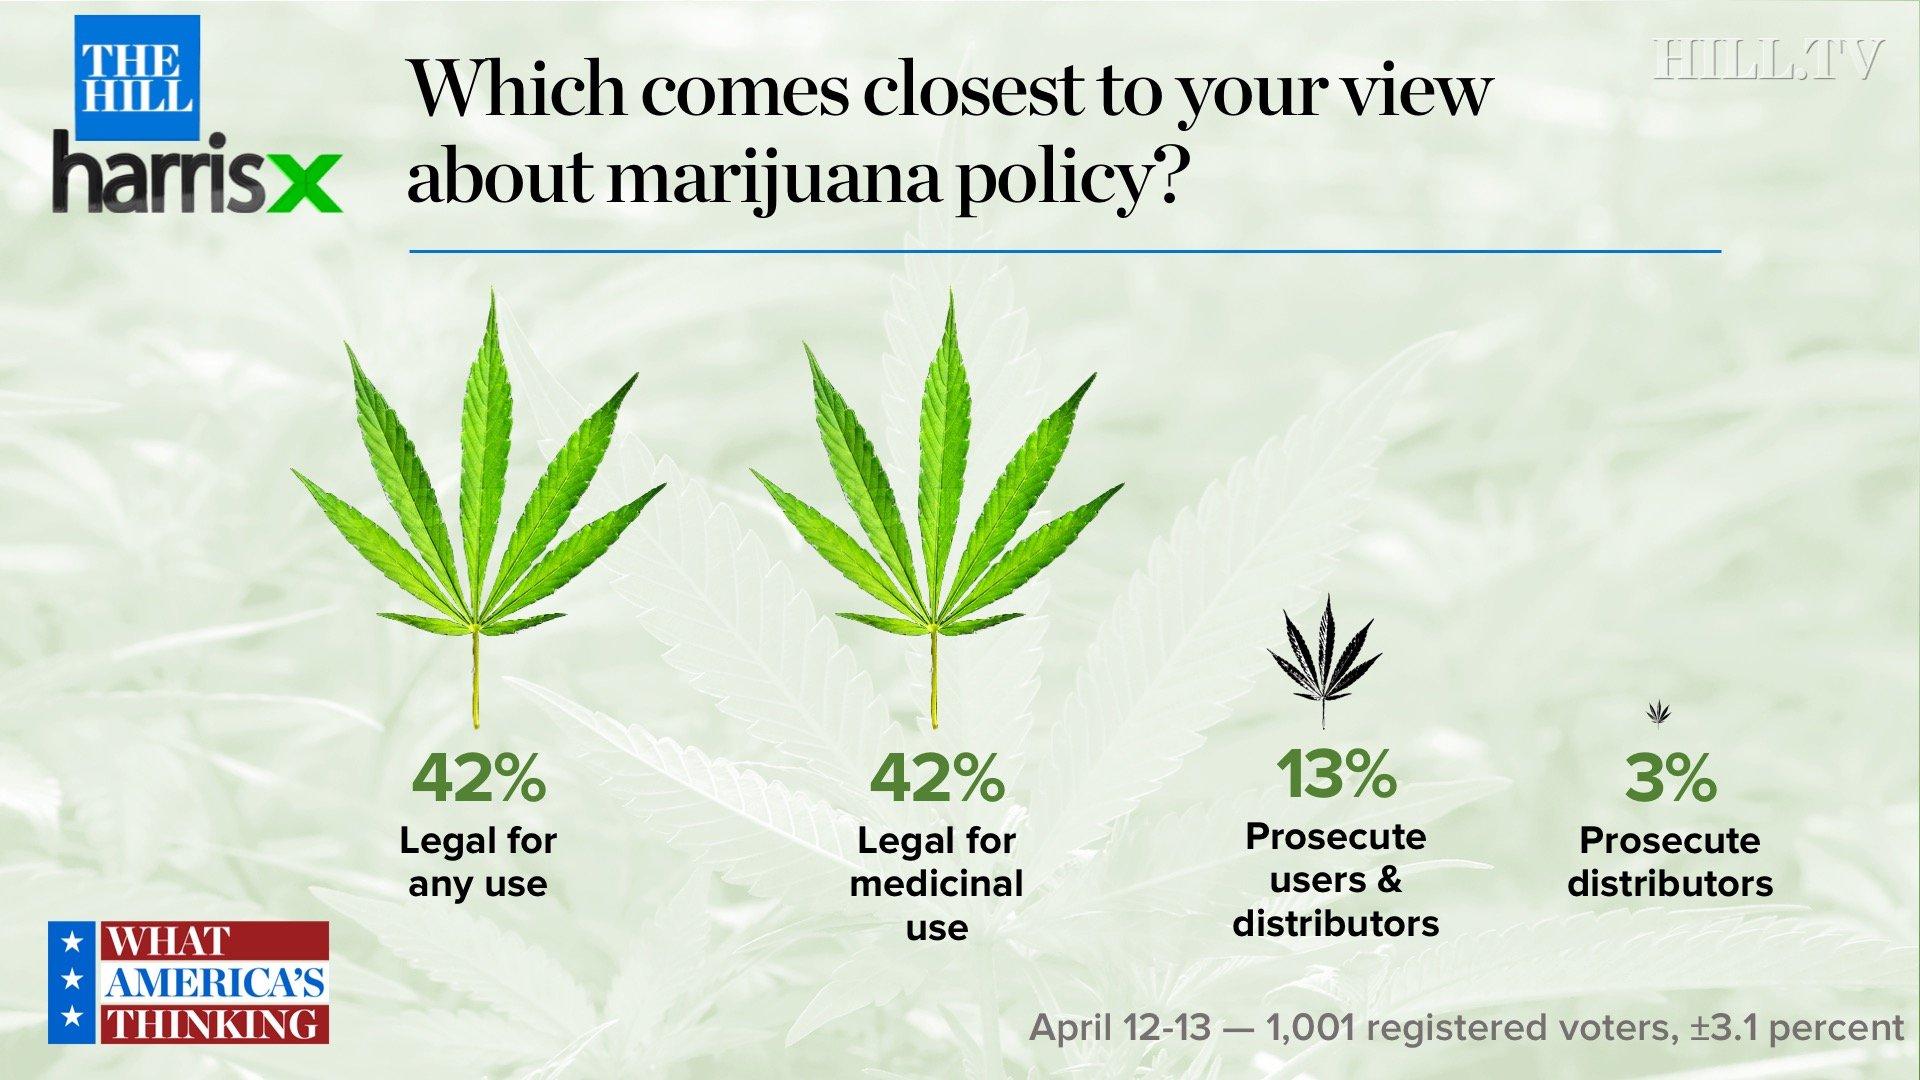 84 percent in new survey say marijuana use should be legal